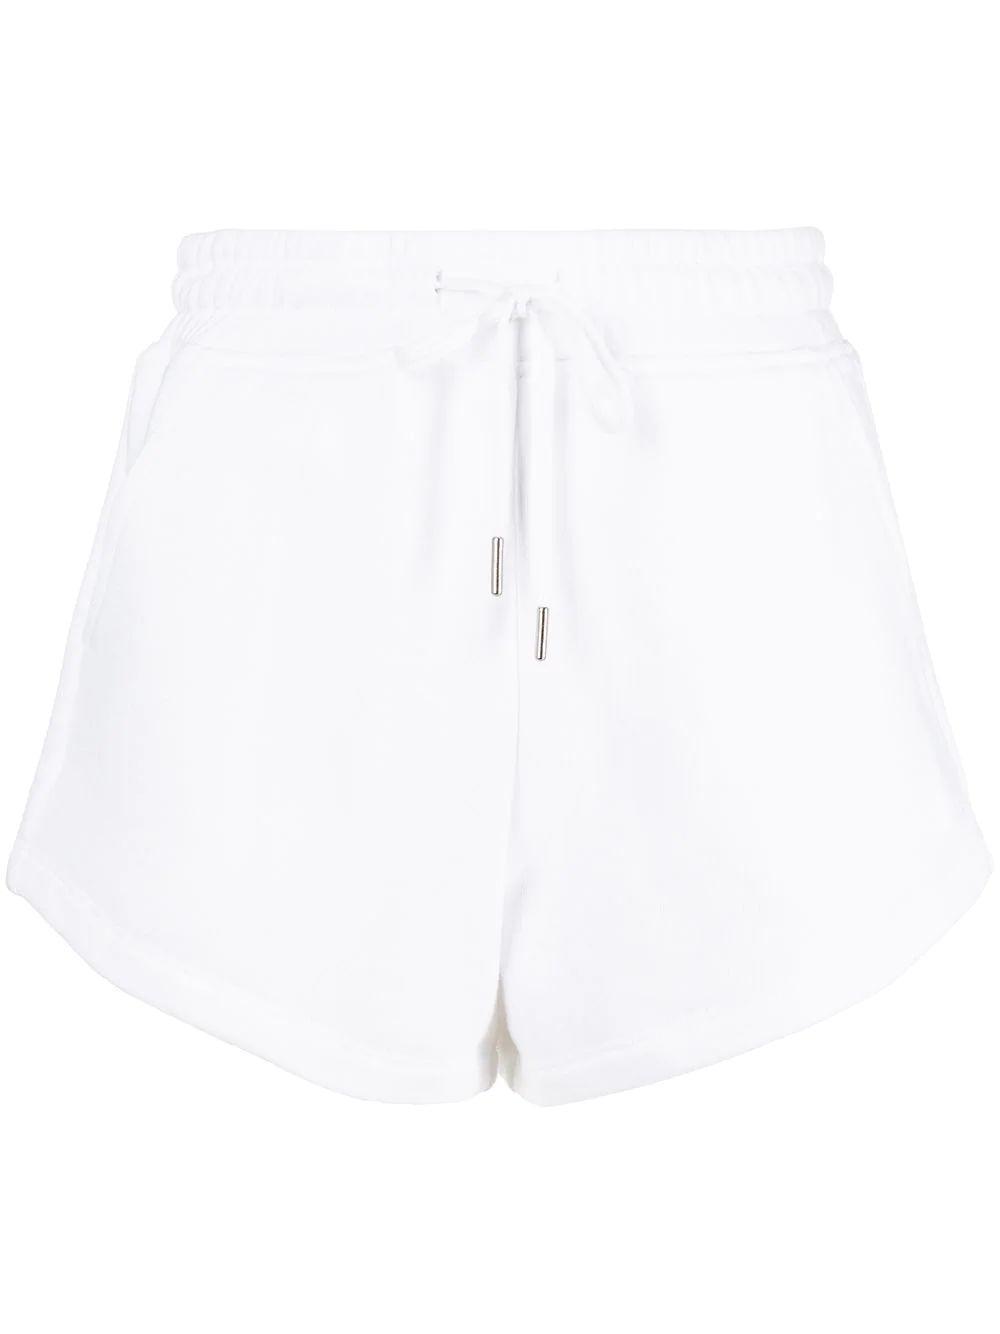 Evie Organic Terry Shorts Item # 321-4037-ST